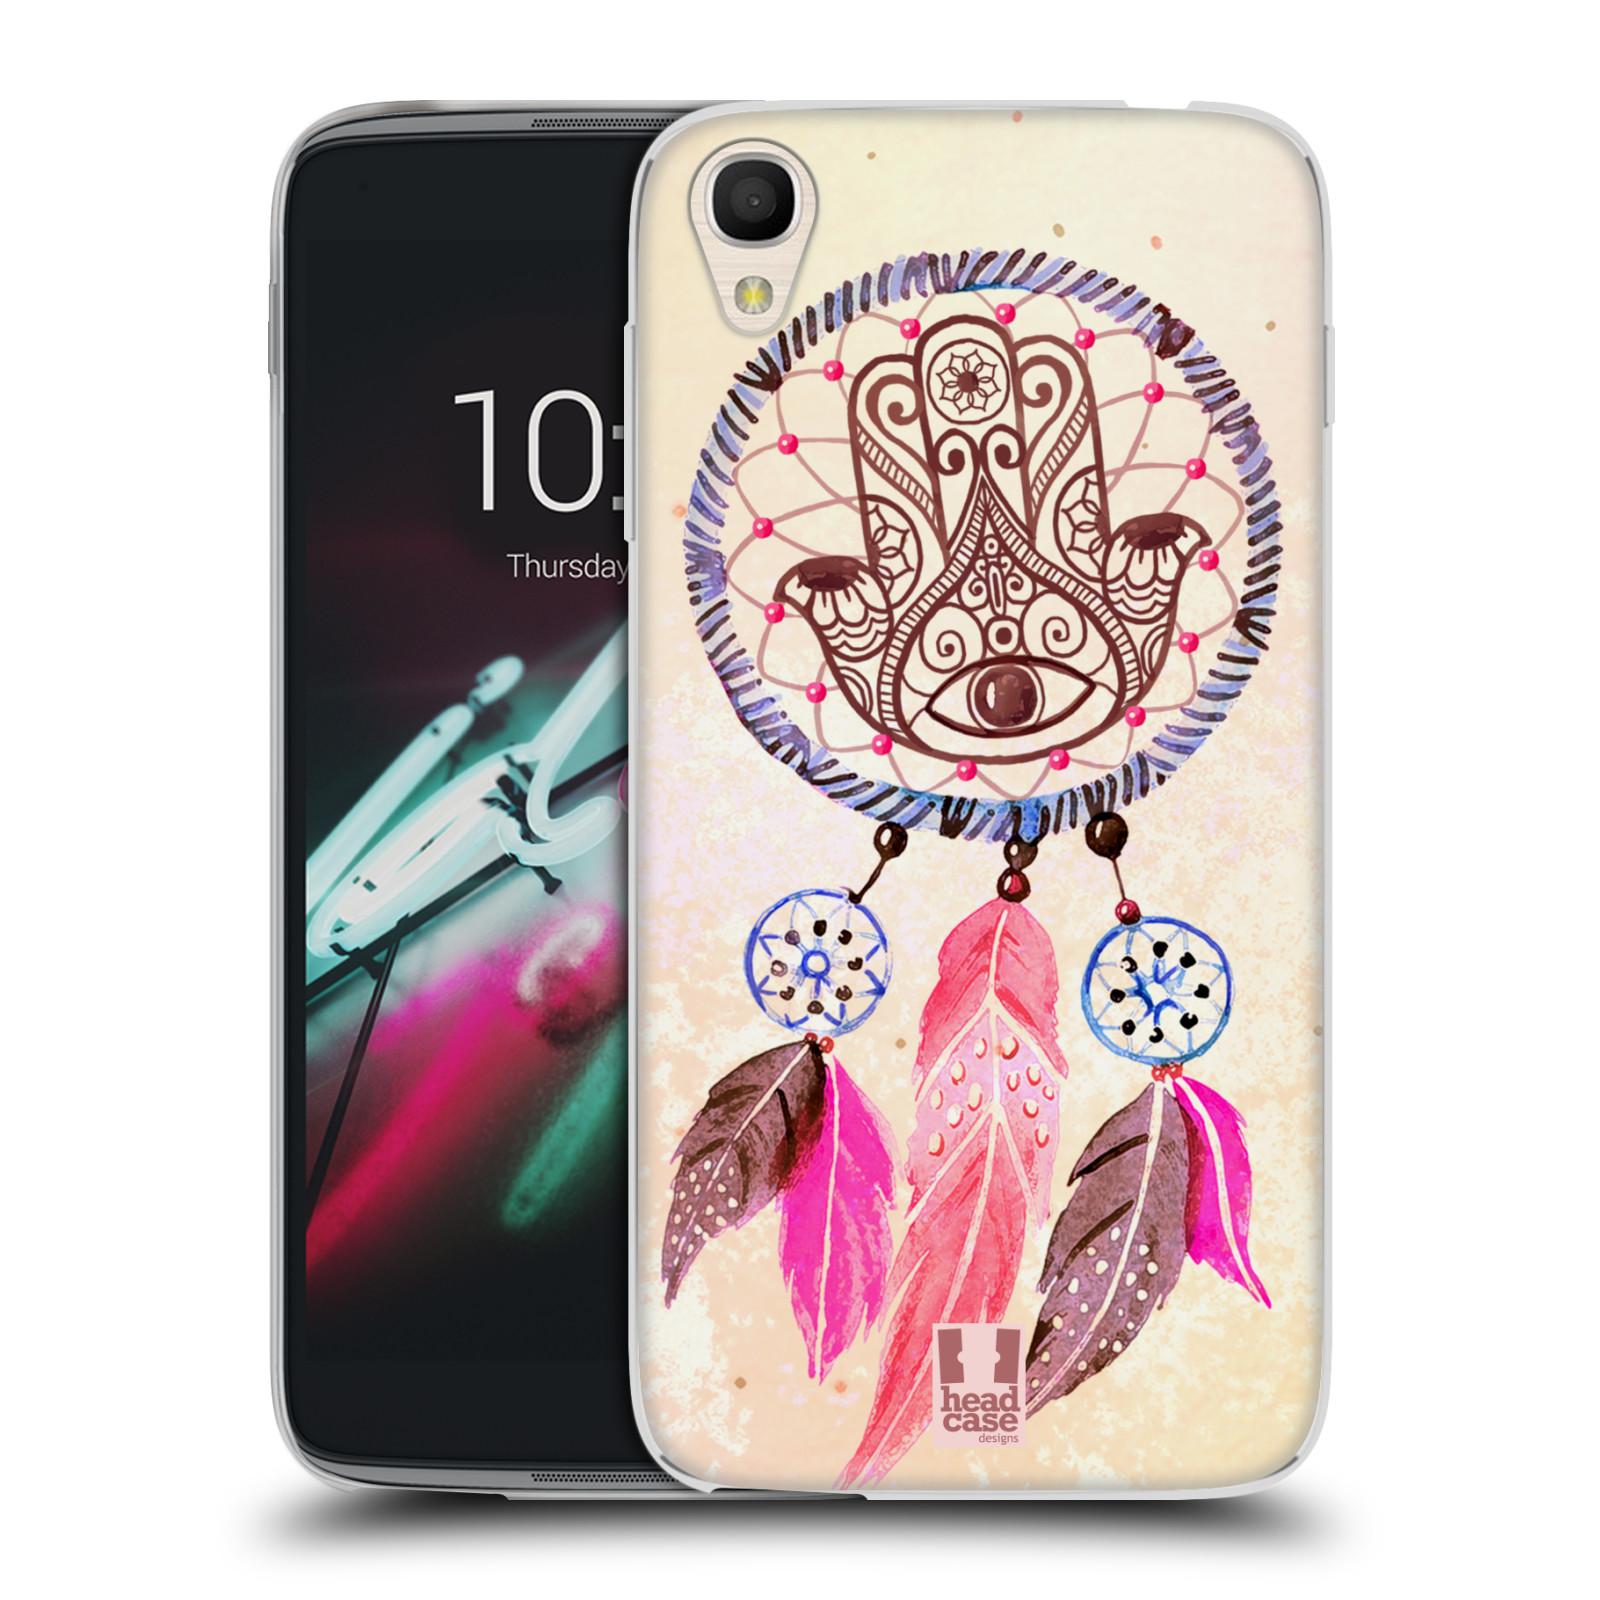 "Silikonové pouzdro na mobil Alcatel One Touch 6039Y Idol 3 HEAD CASE Lapač Assorted Hamsa (Silikonový kryt či obal na mobilní telefon Alcatel One Touch Idol 3 OT-6039Y s 4,7"" displejem)"